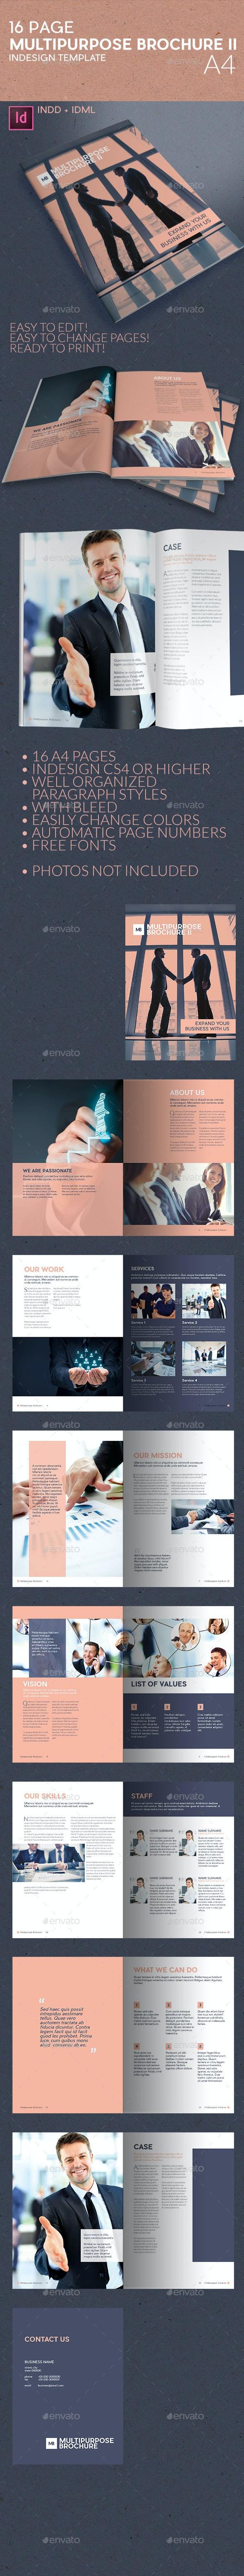 Multipurpose Business Brochure II A4 - Informational Brochures